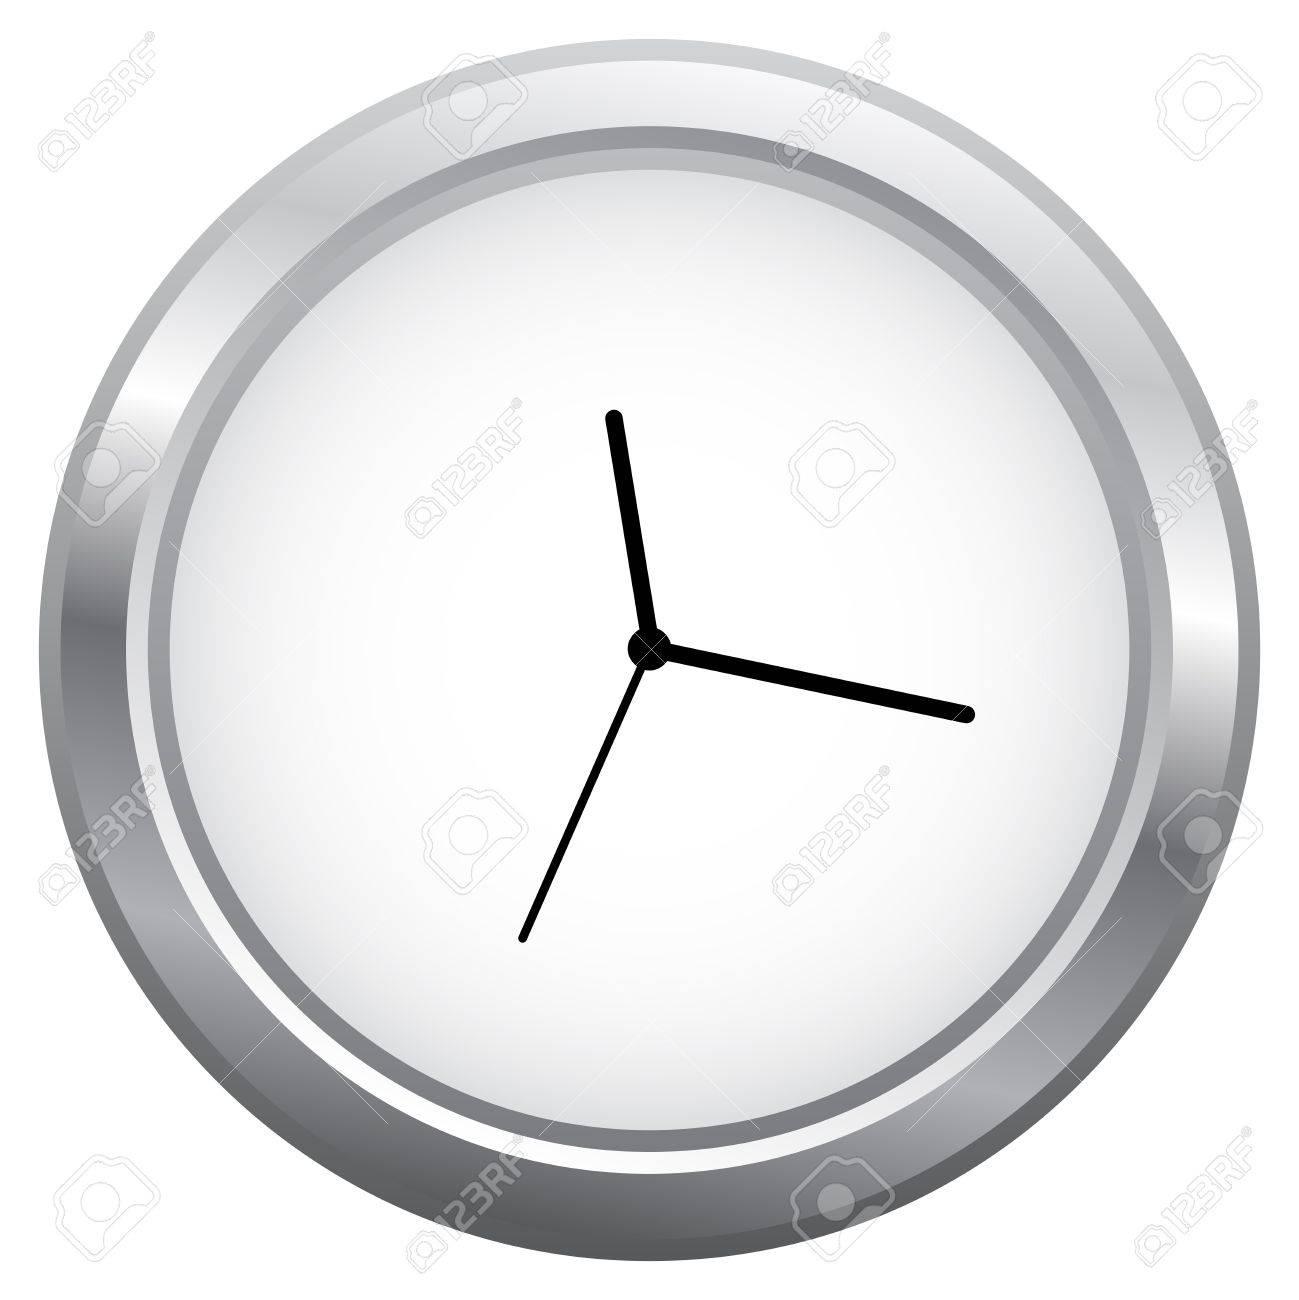 Minimalist Clock Isolated On White Stock Vector - 18625297